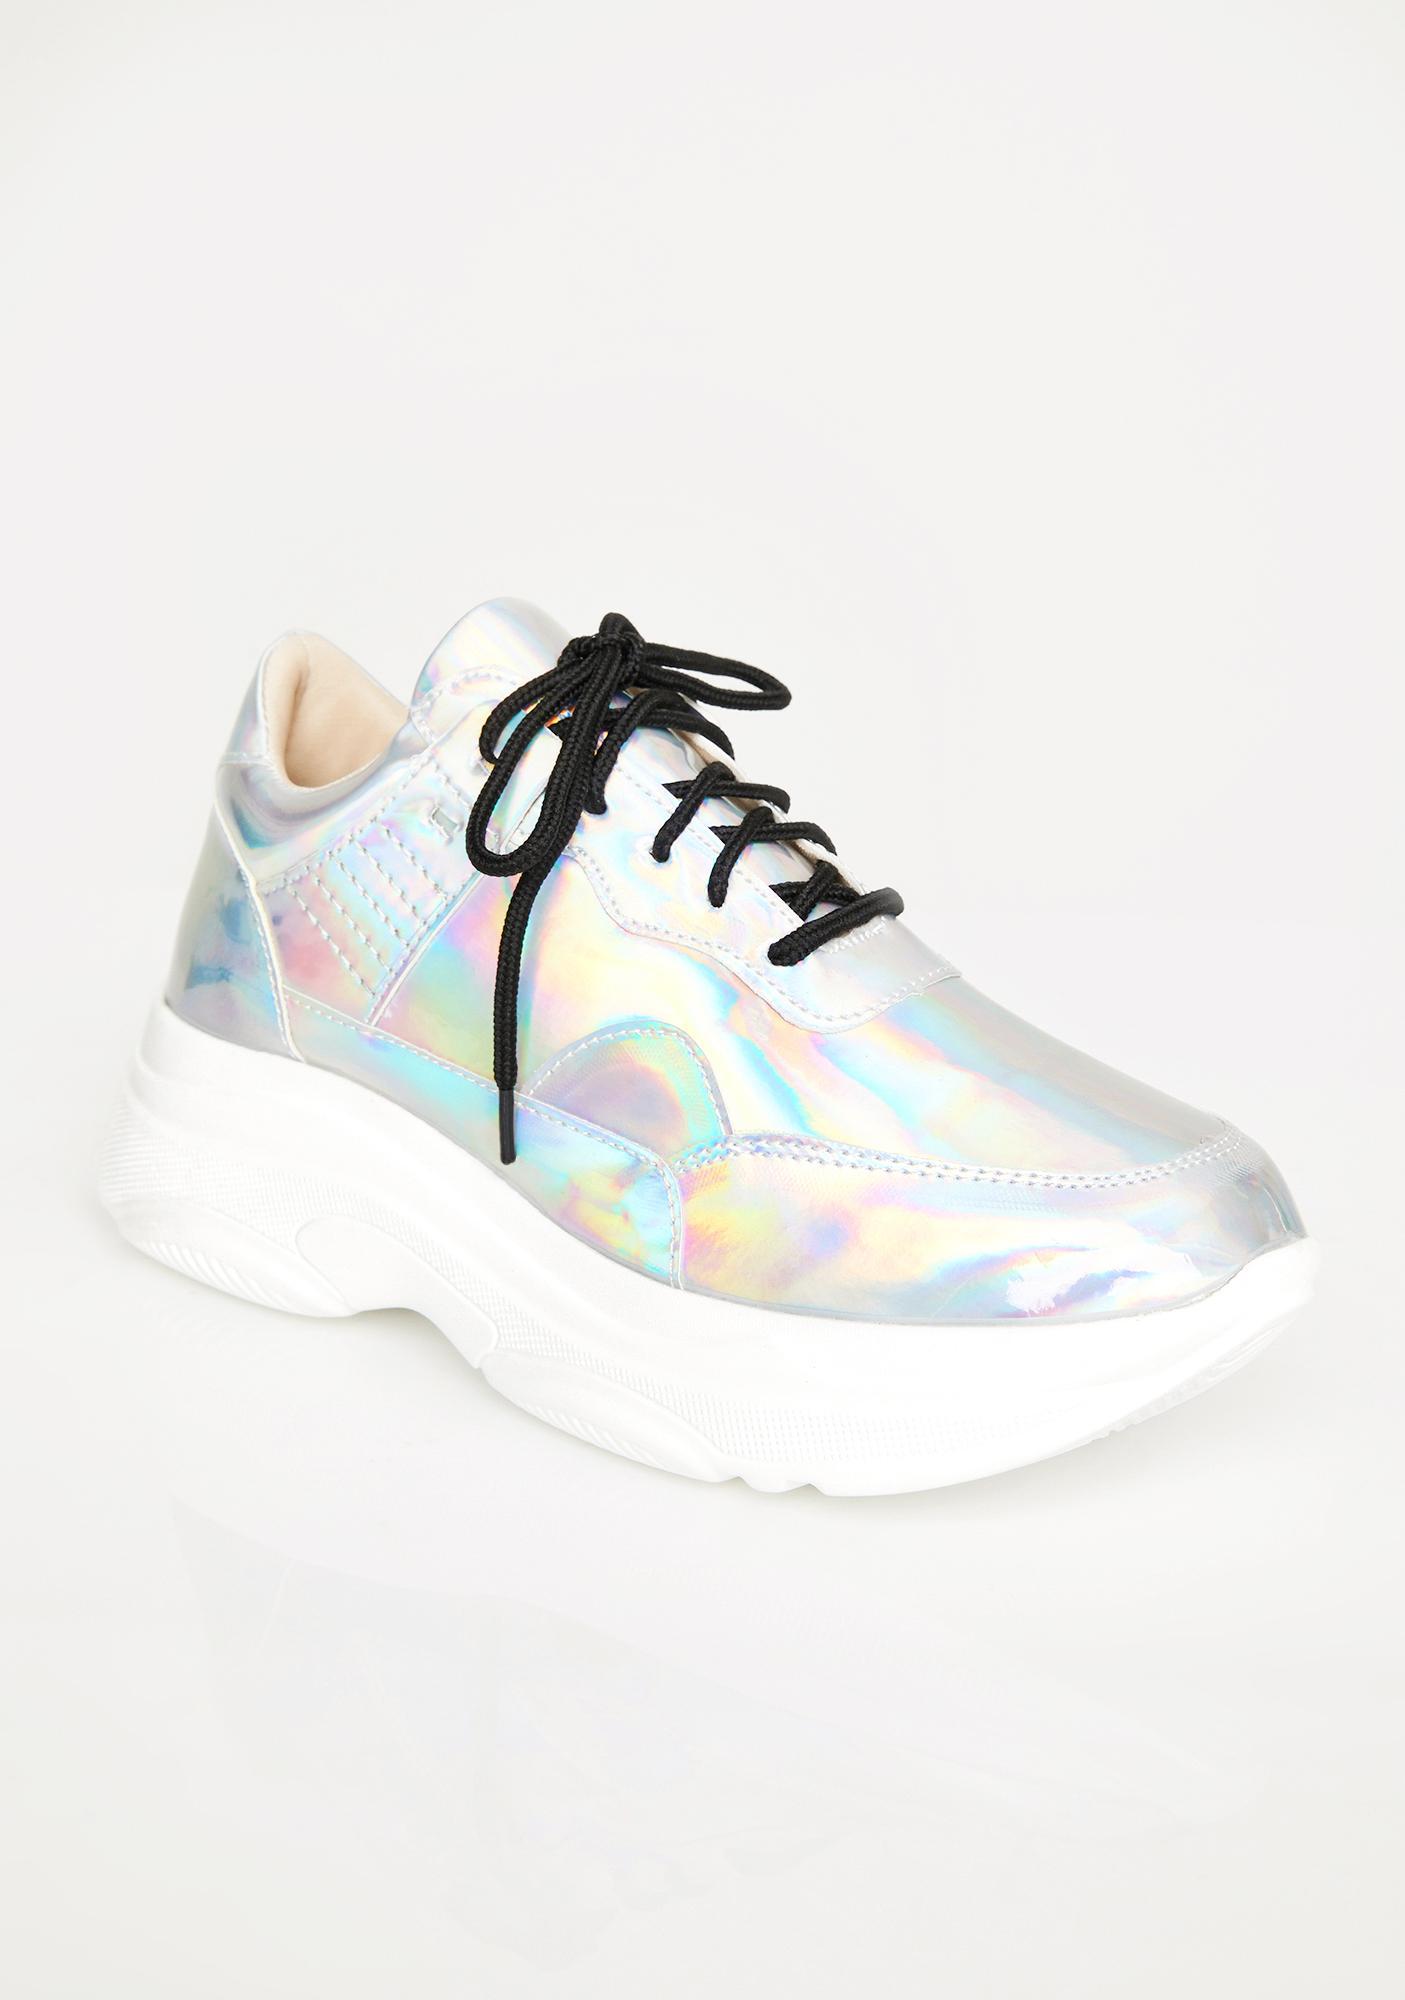 Stellar Strut Holographic Sneakers